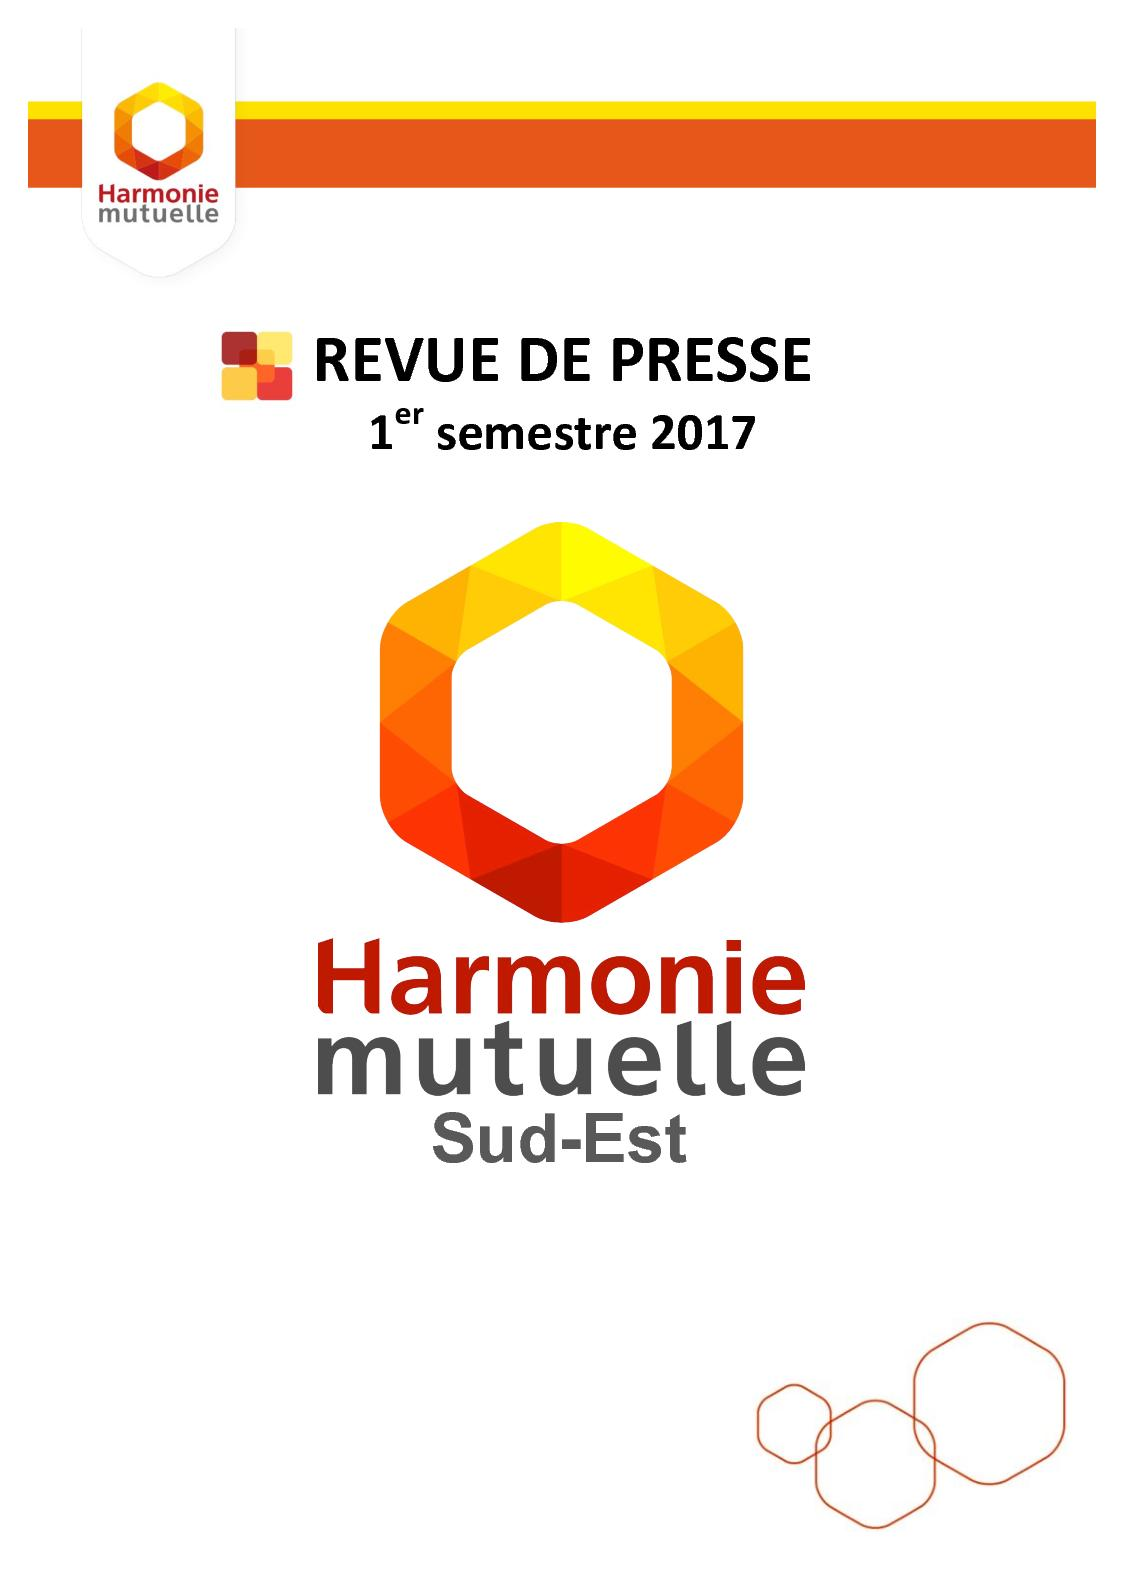 847f4e82965de4 Calaméo - Revue De Presse 1er semestre 2017 Harmonie Mutuelle